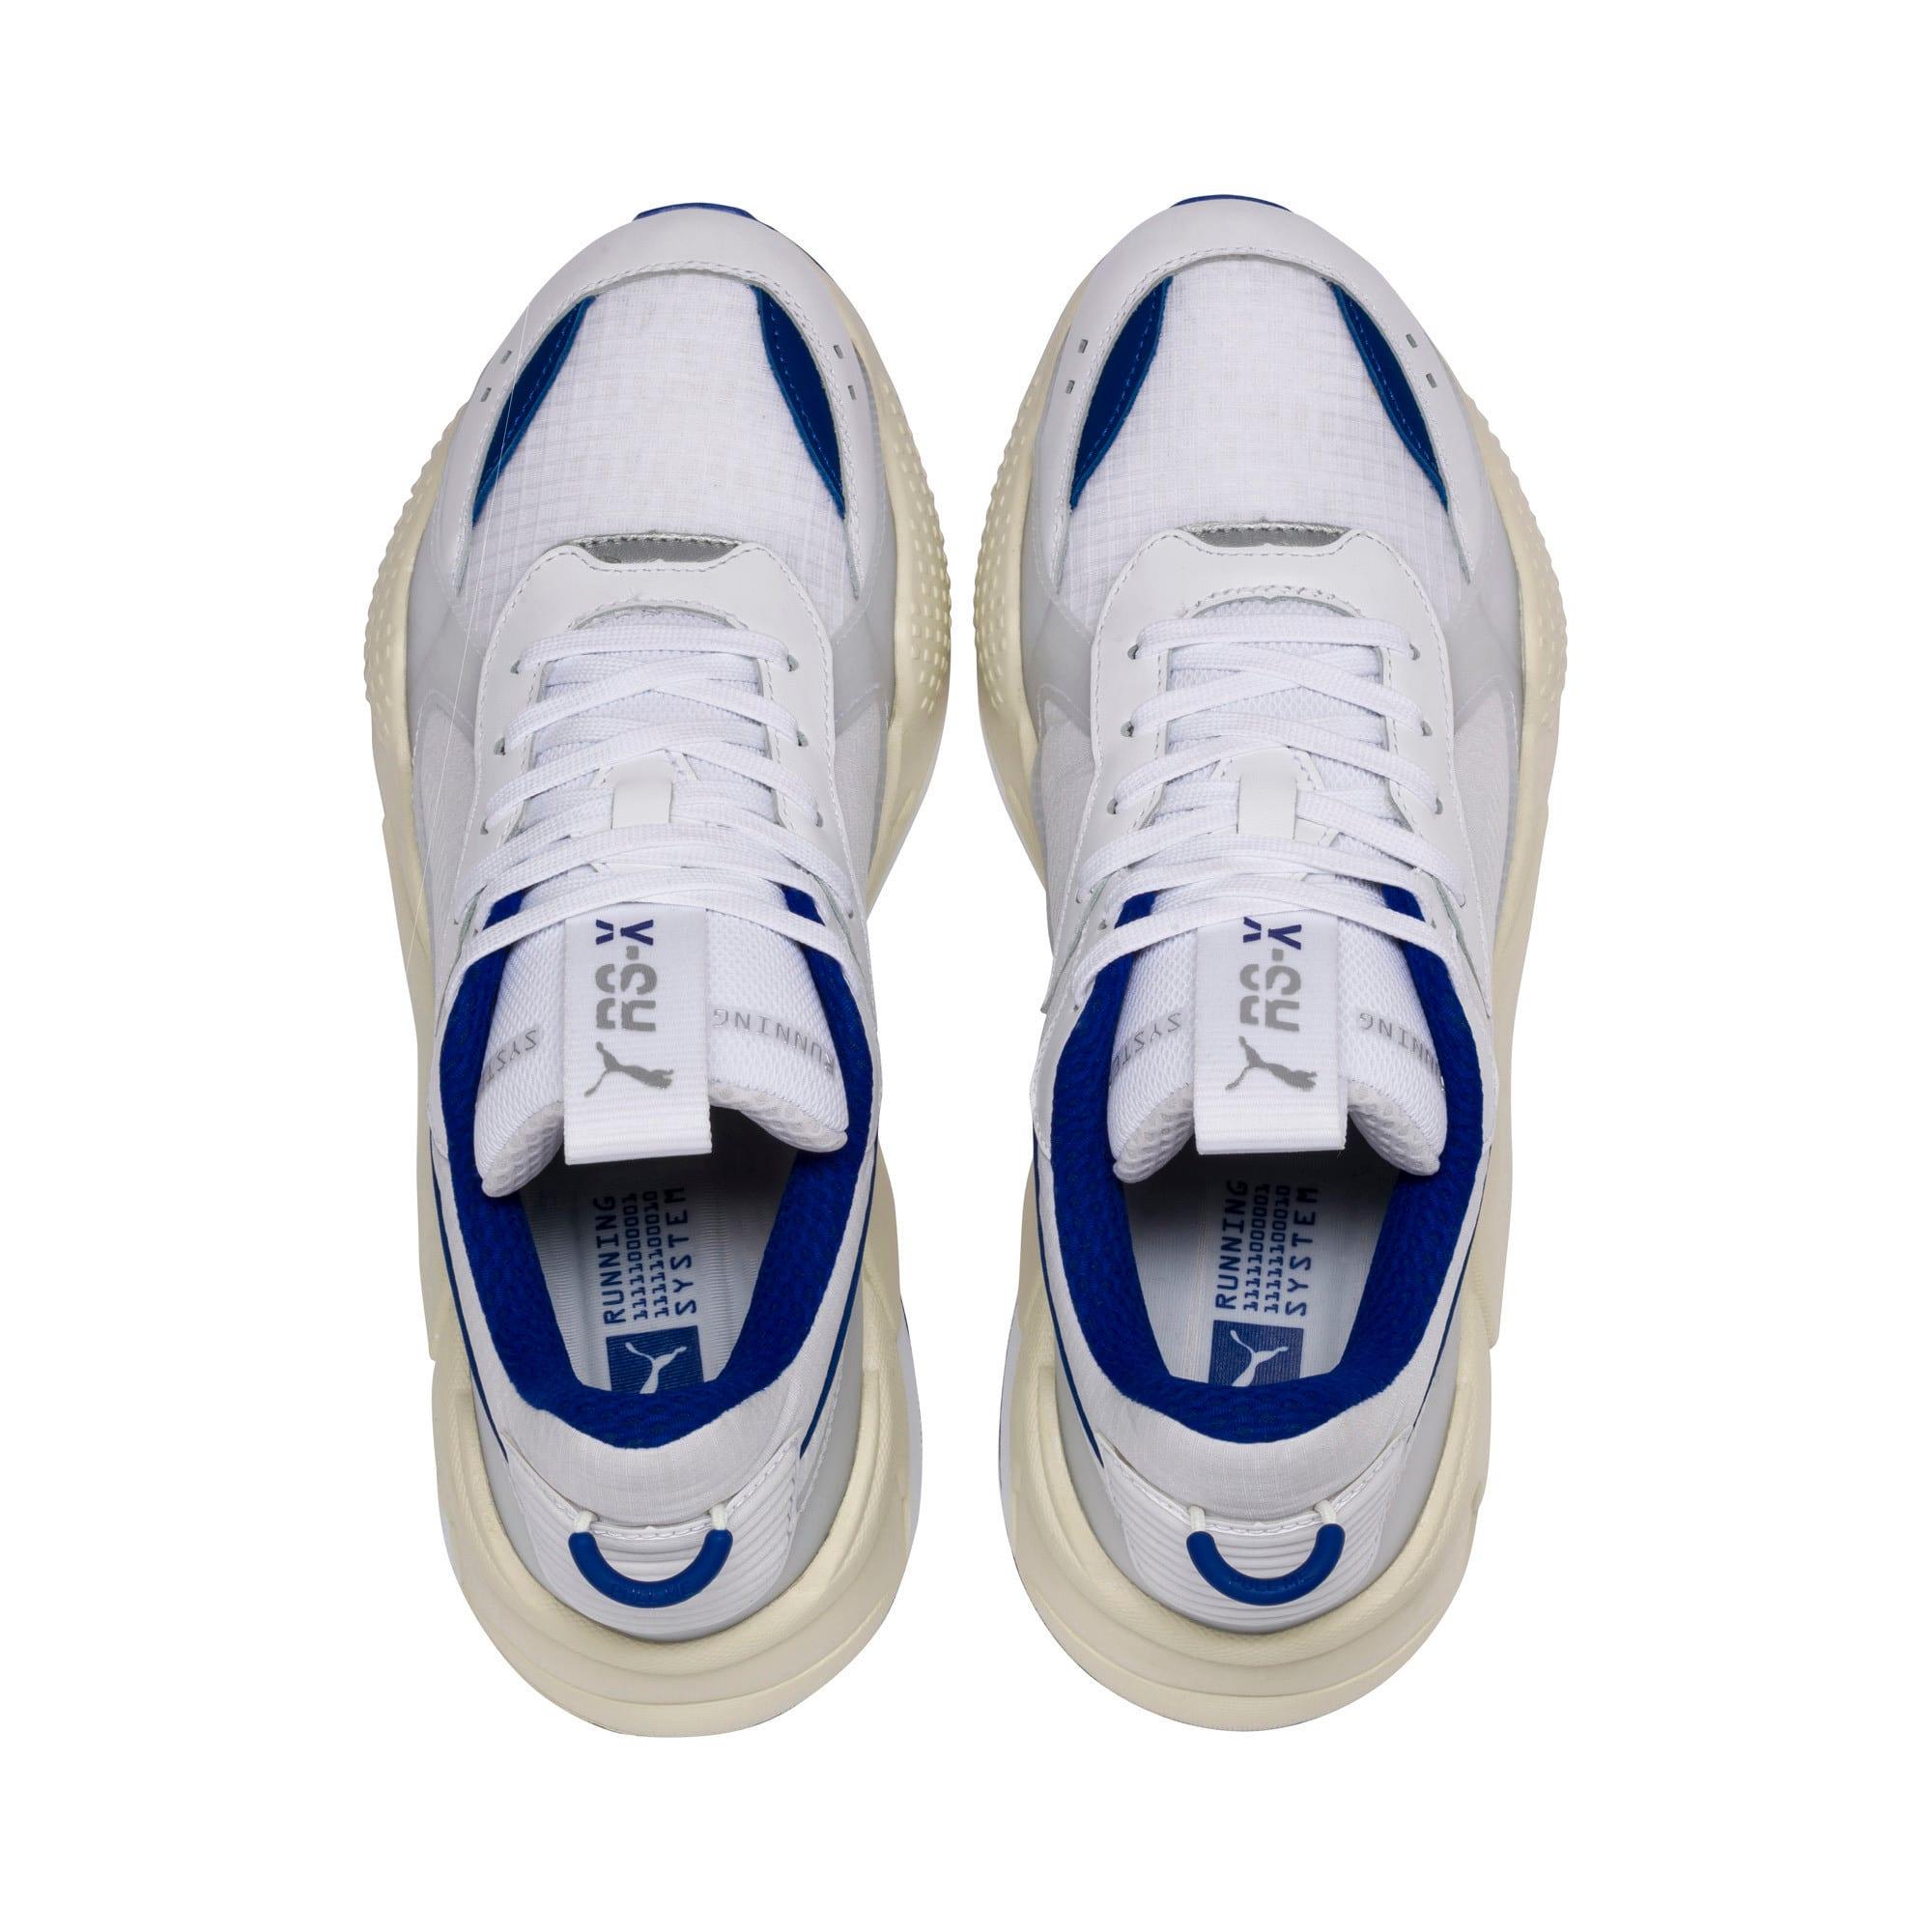 Thumbnail 7 of RS-X Tech Sneaker, Puma White-Whisper White, medium